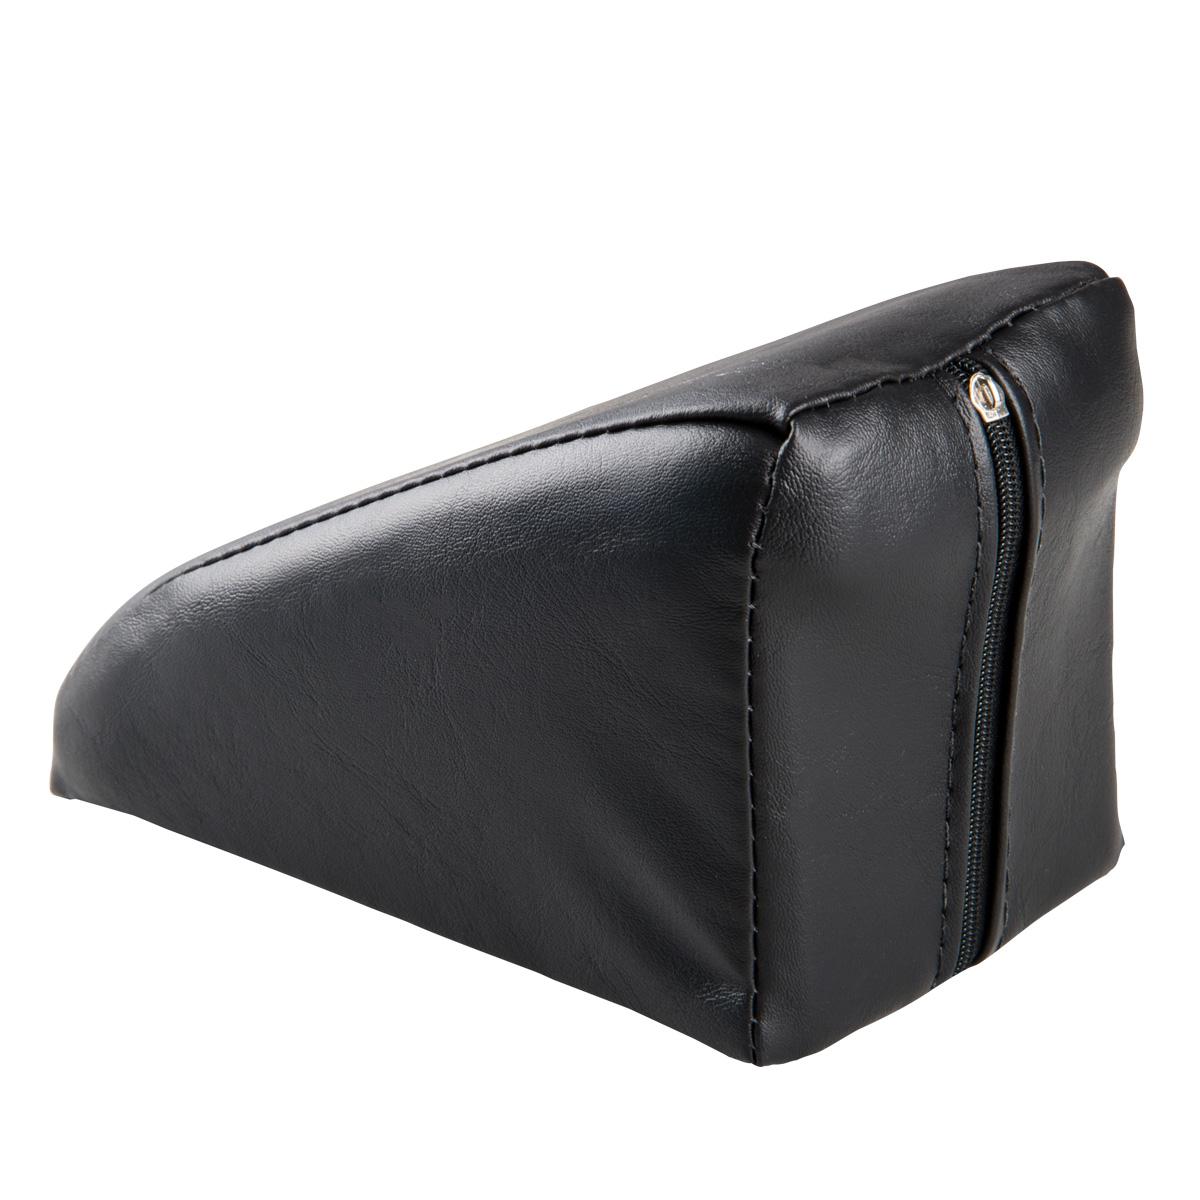 Dejarnette Wedge Style Wedge 1008843 W15062b 3b